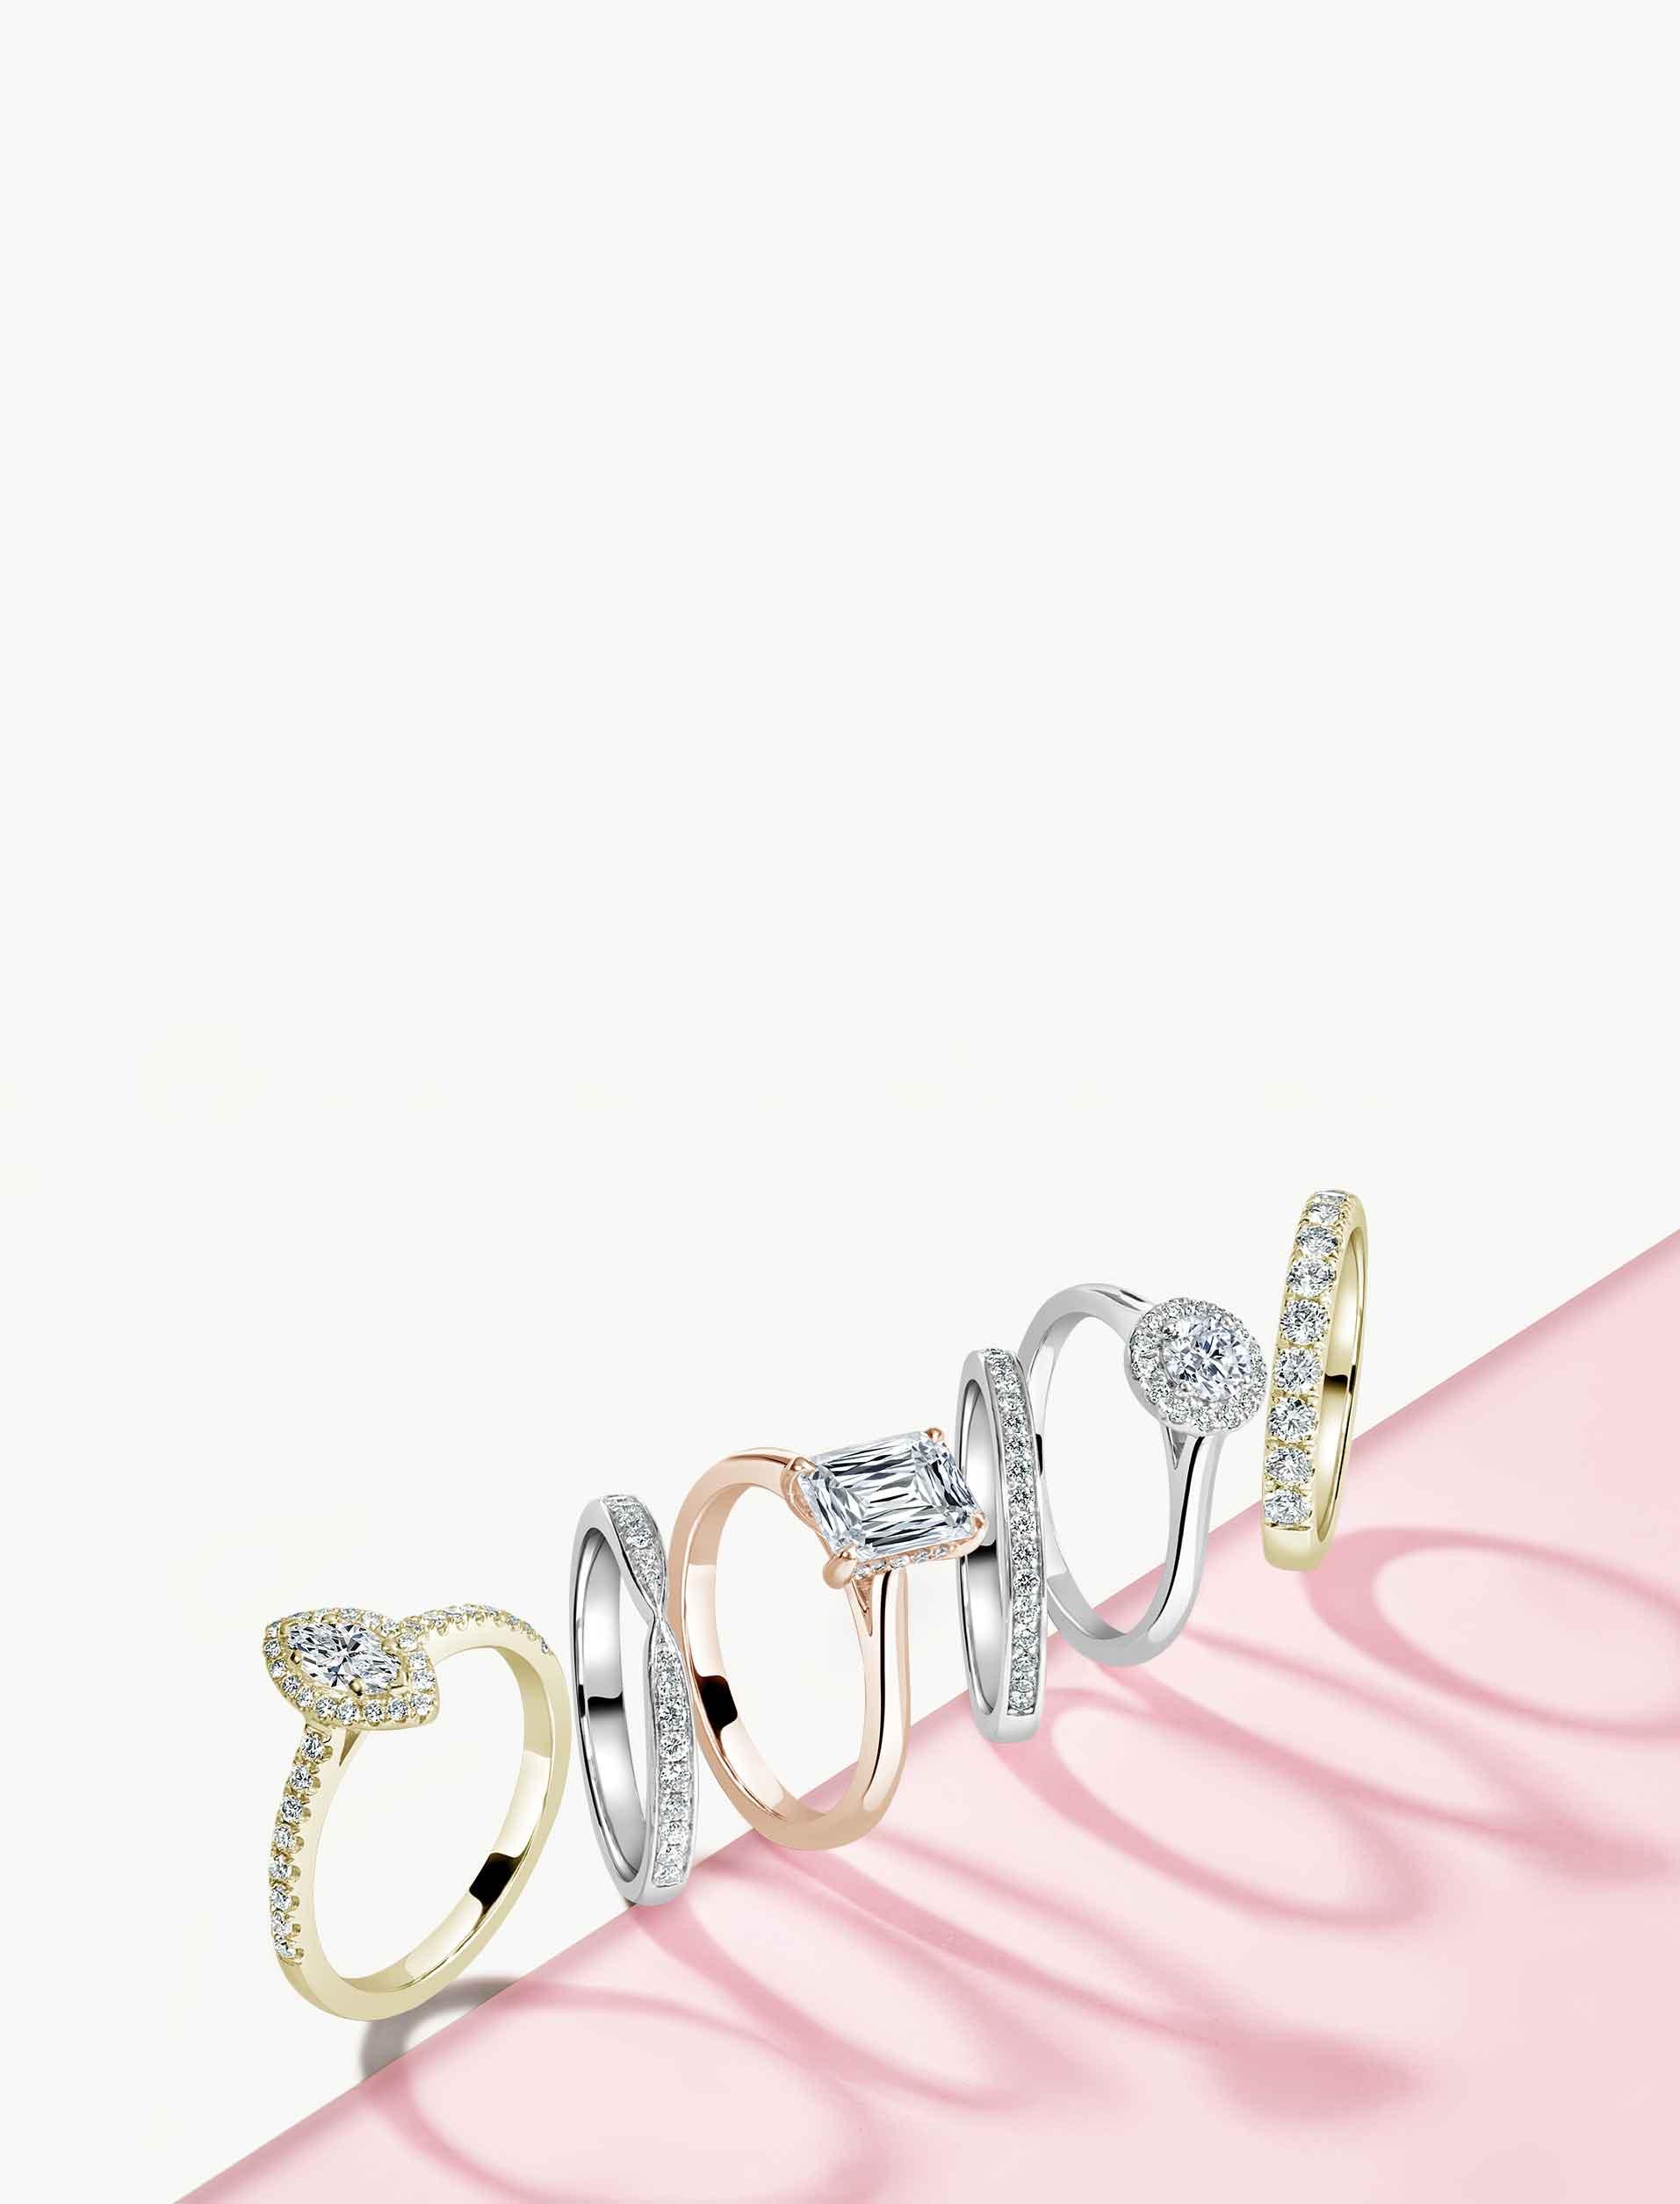 Rose Gold Pear Shaped Engagement Rings - Steven Stone